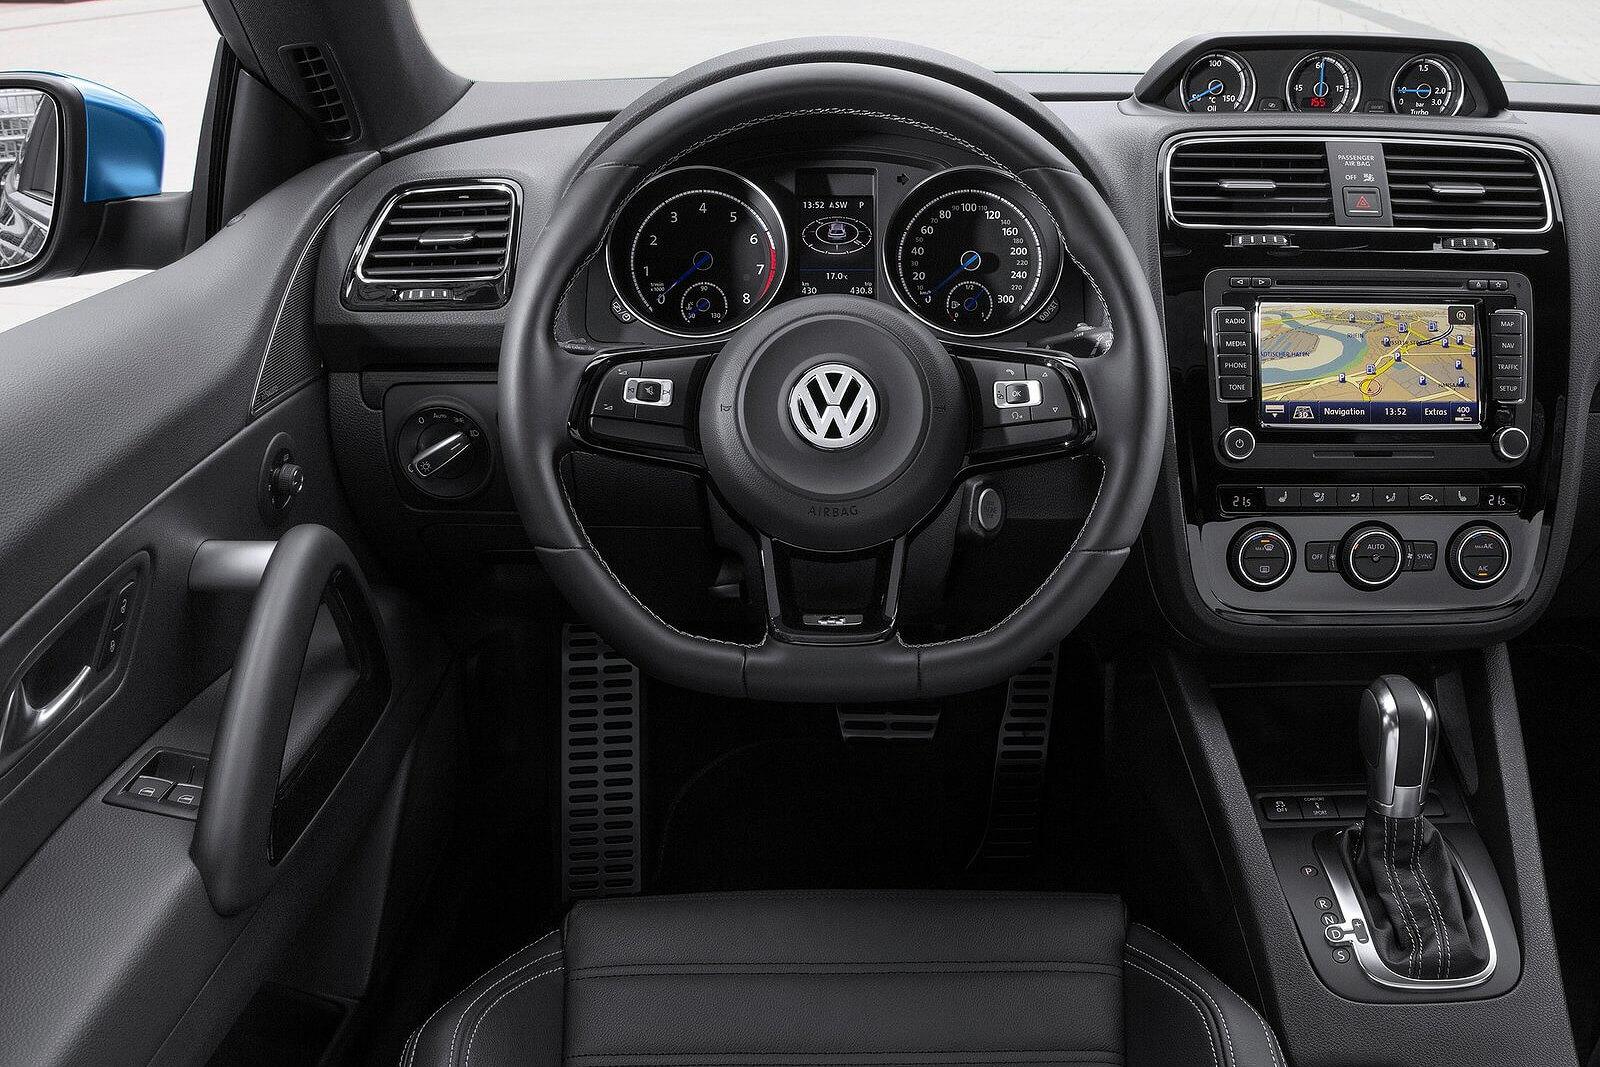 volkswagen scirocco 2 0 tdi 150 r line manual vw leasing. Black Bedroom Furniture Sets. Home Design Ideas